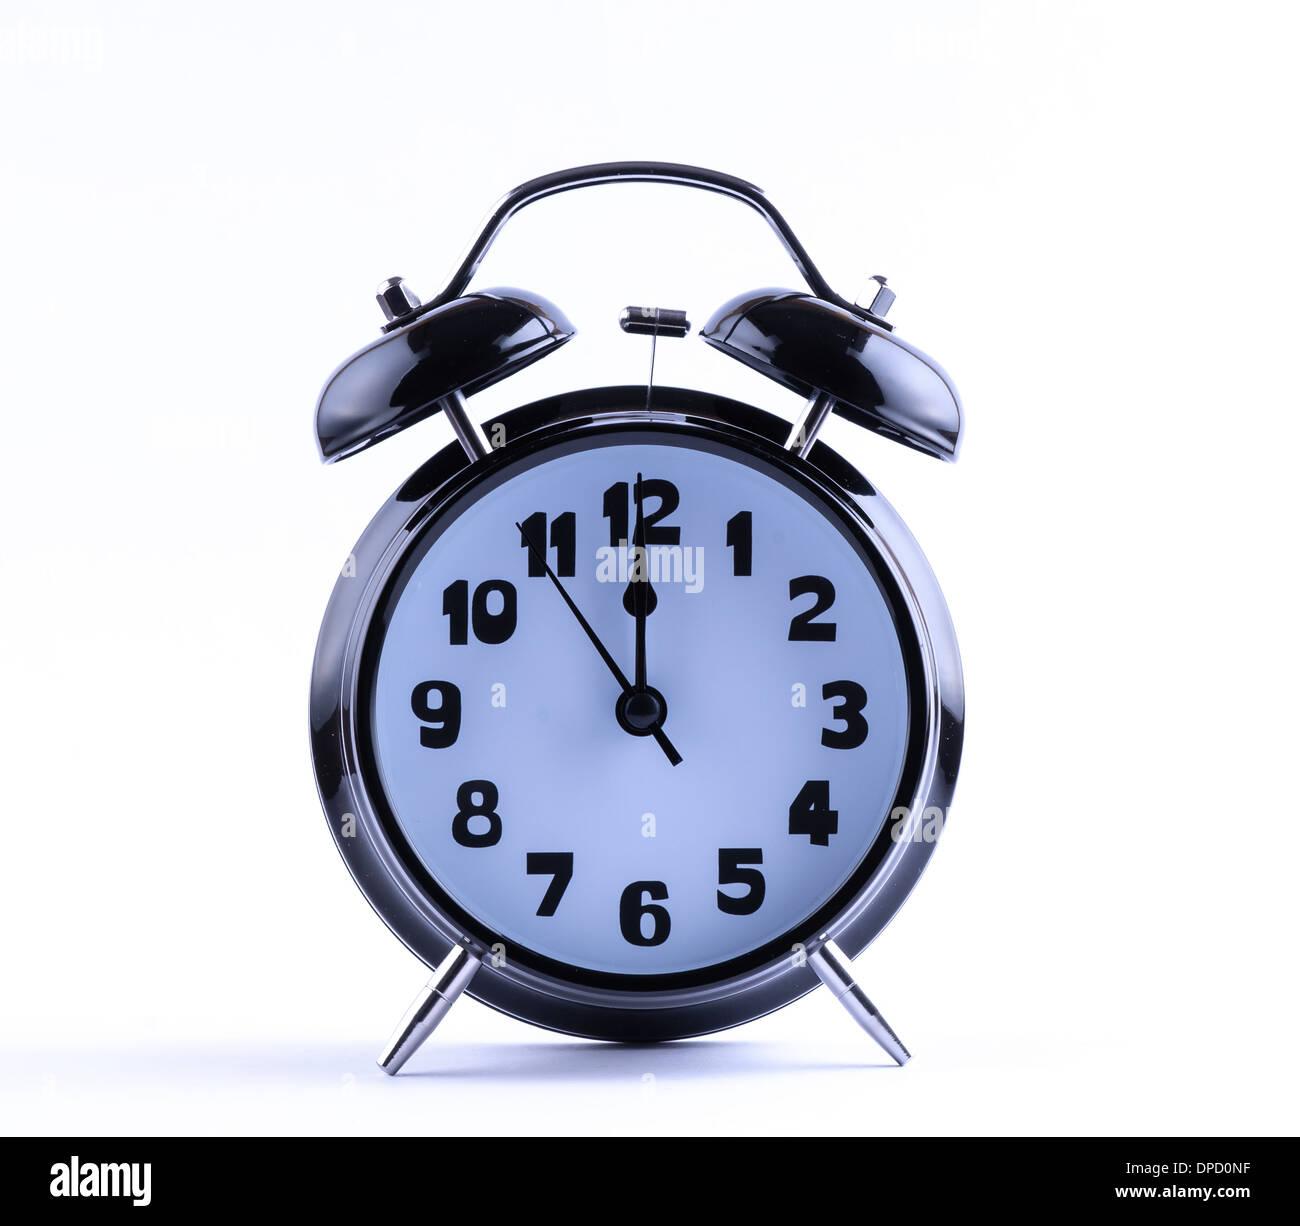 Alram clock on white background with twelve o'clock - Stock Image